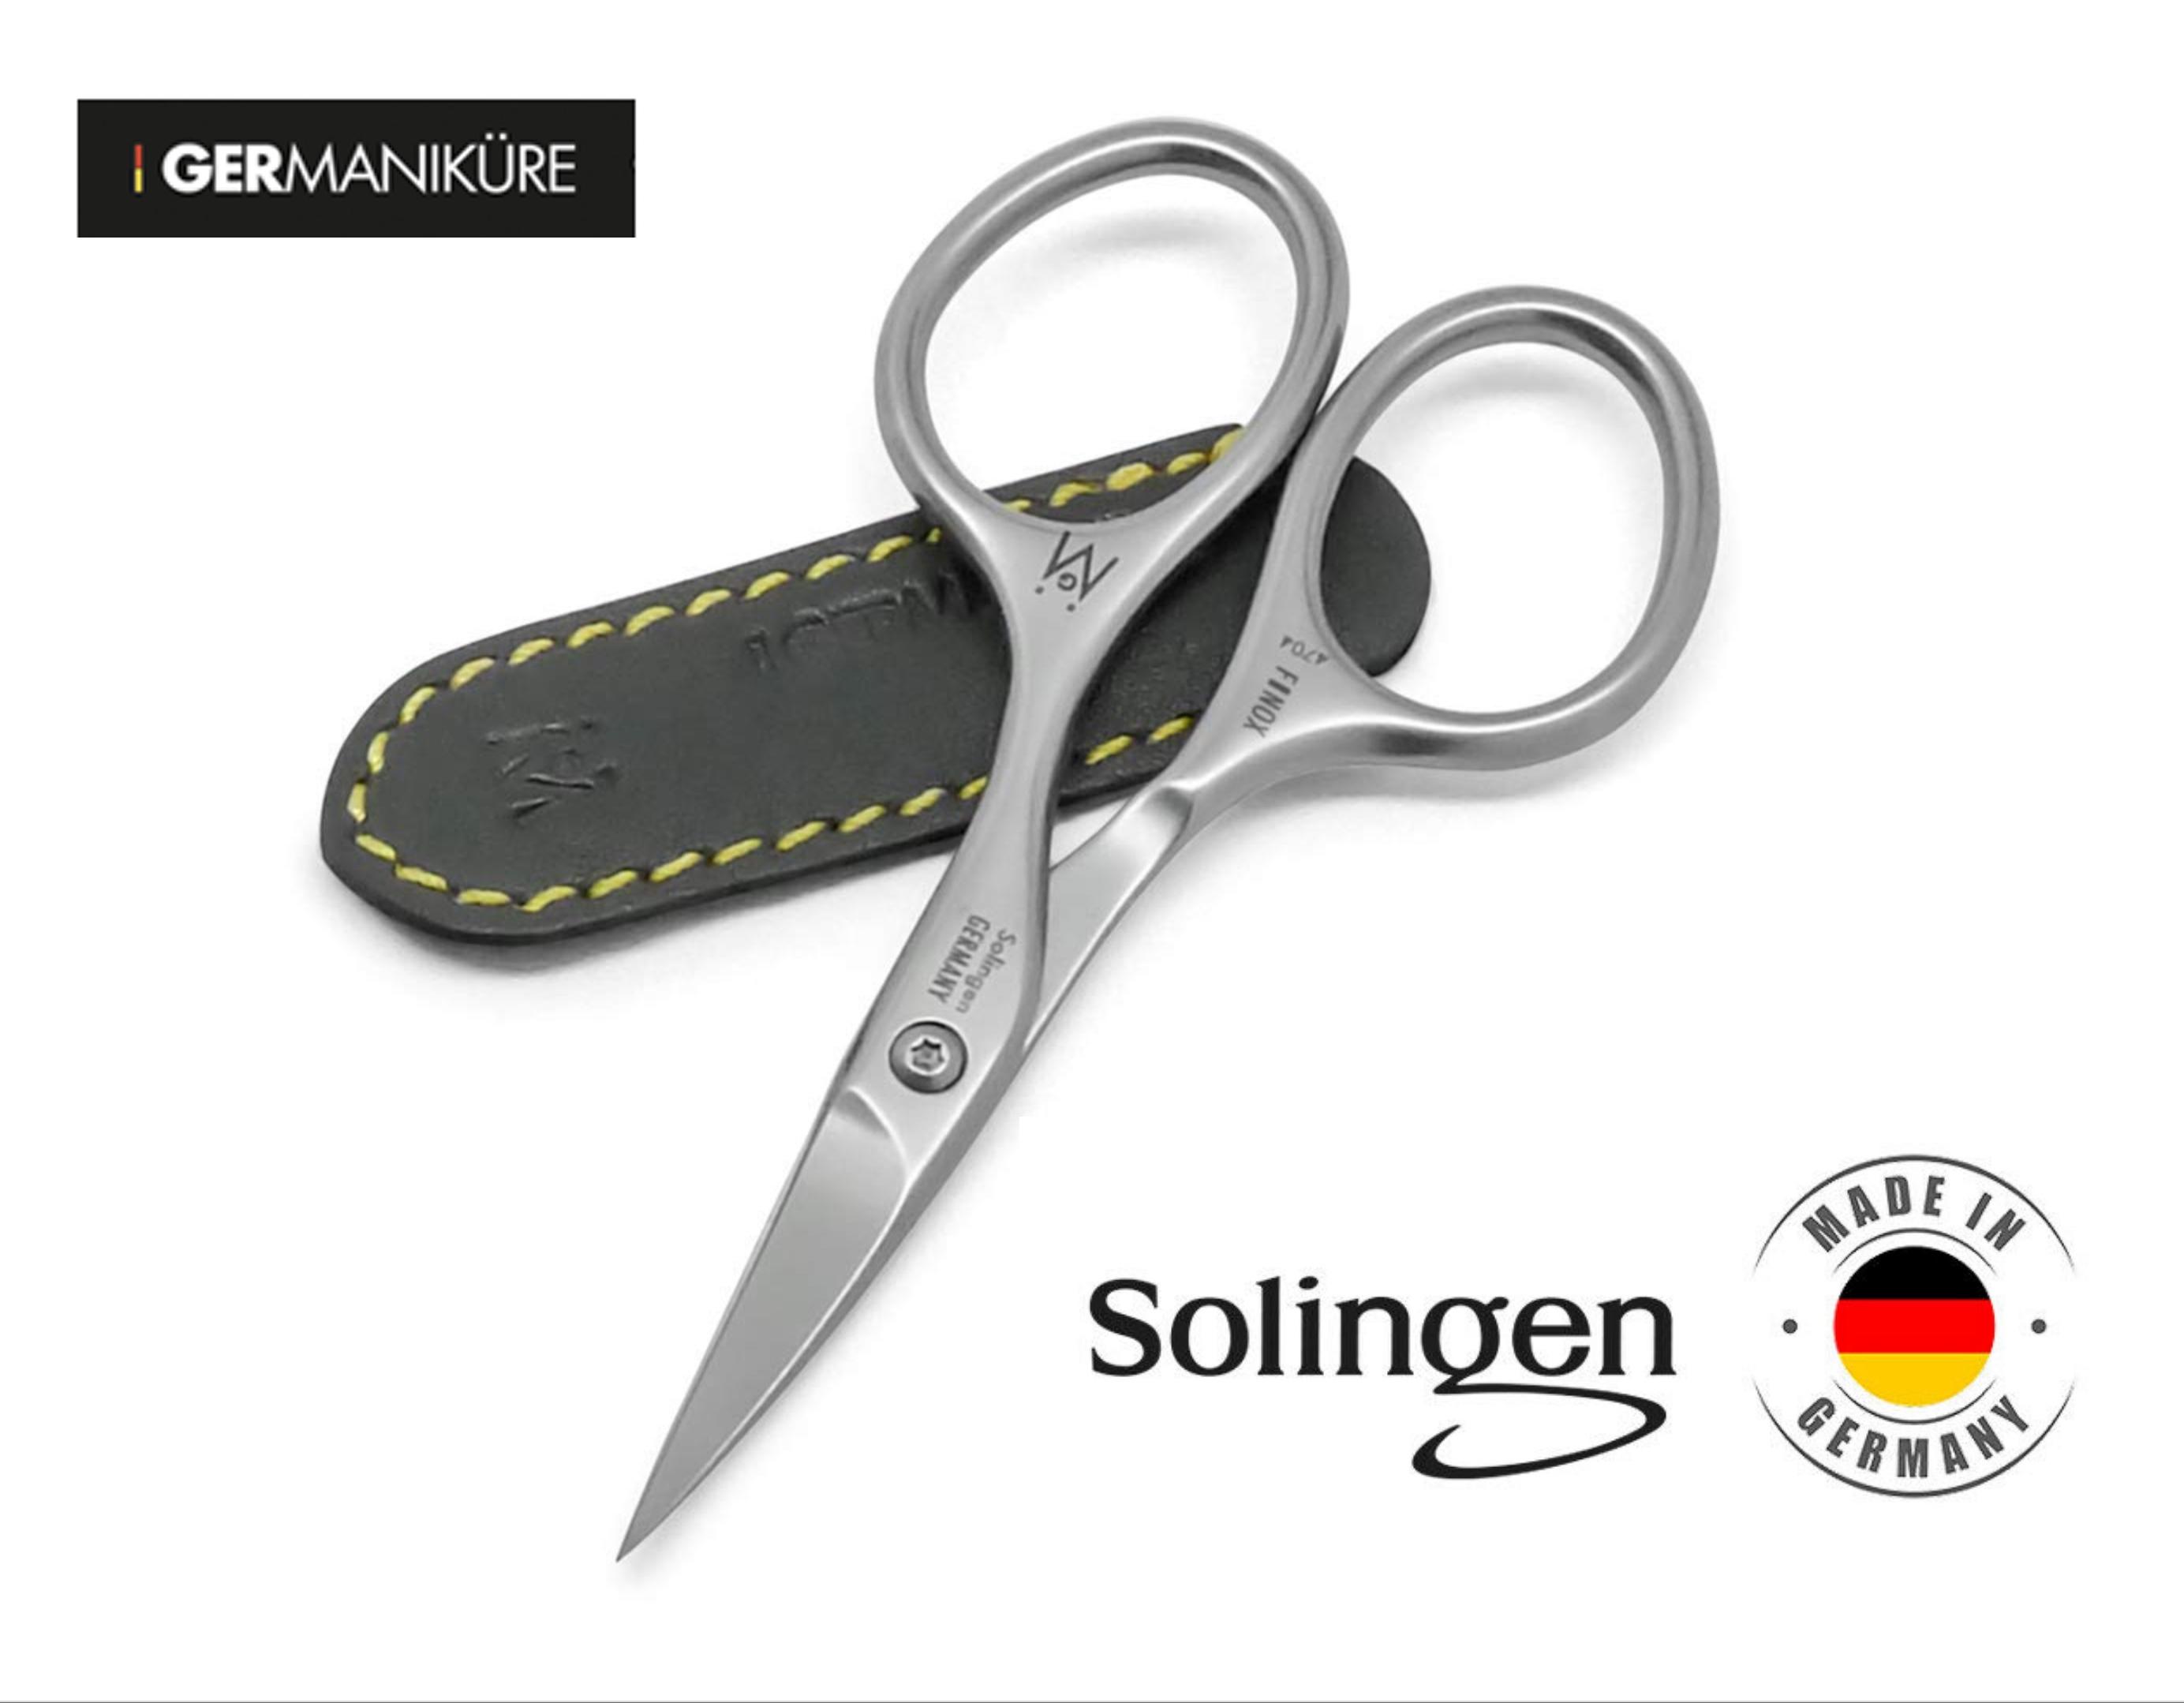 GERmanikure Solingen- FINOX Professional Scissors 94-30 Curved 4703